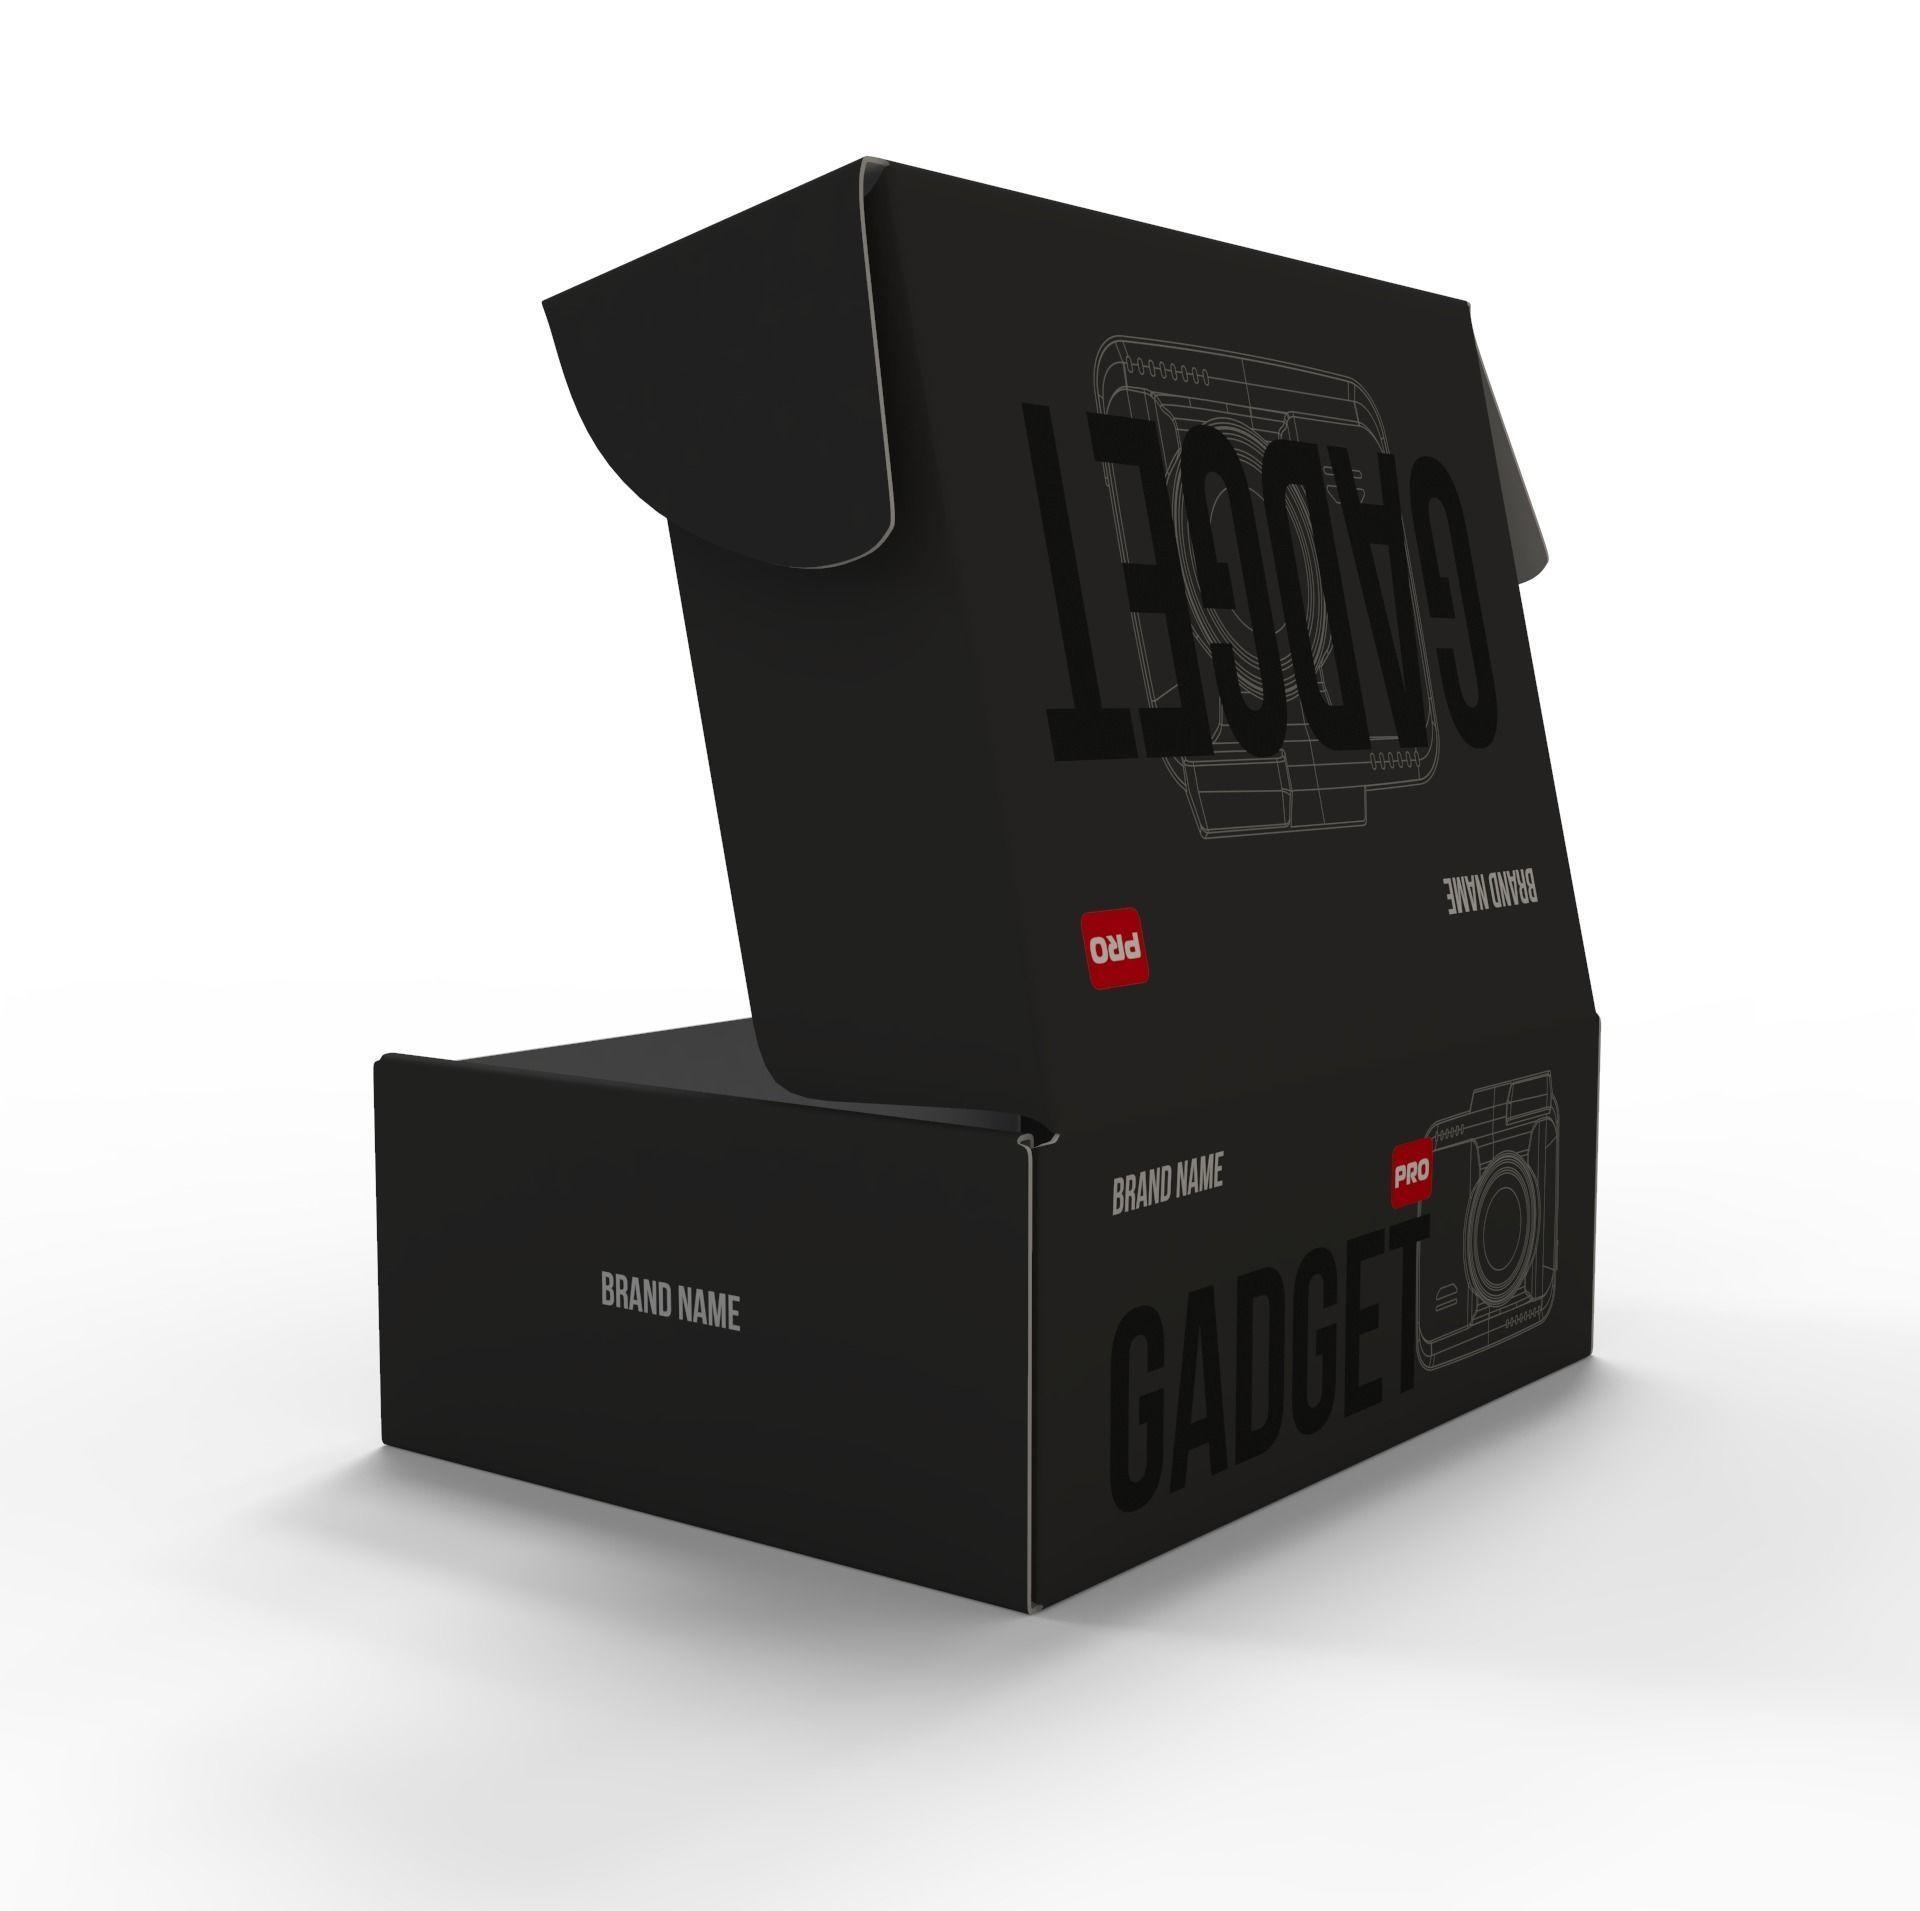 Self-assembly box